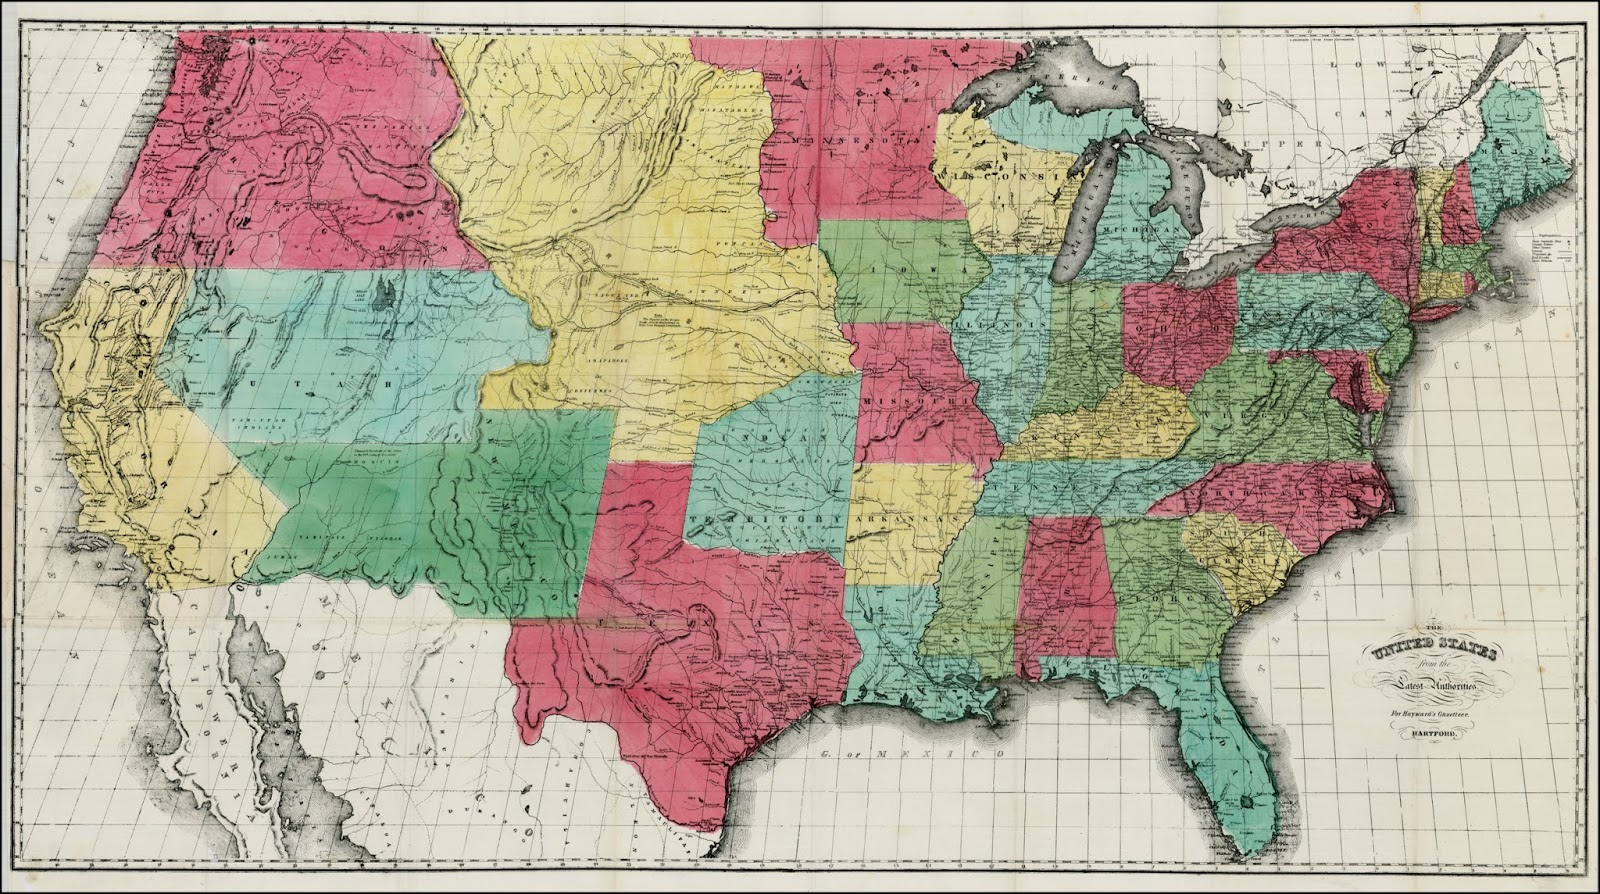 Antique Prints Blog The Origins Of The Nebraska Territory - Show nebraska on us map